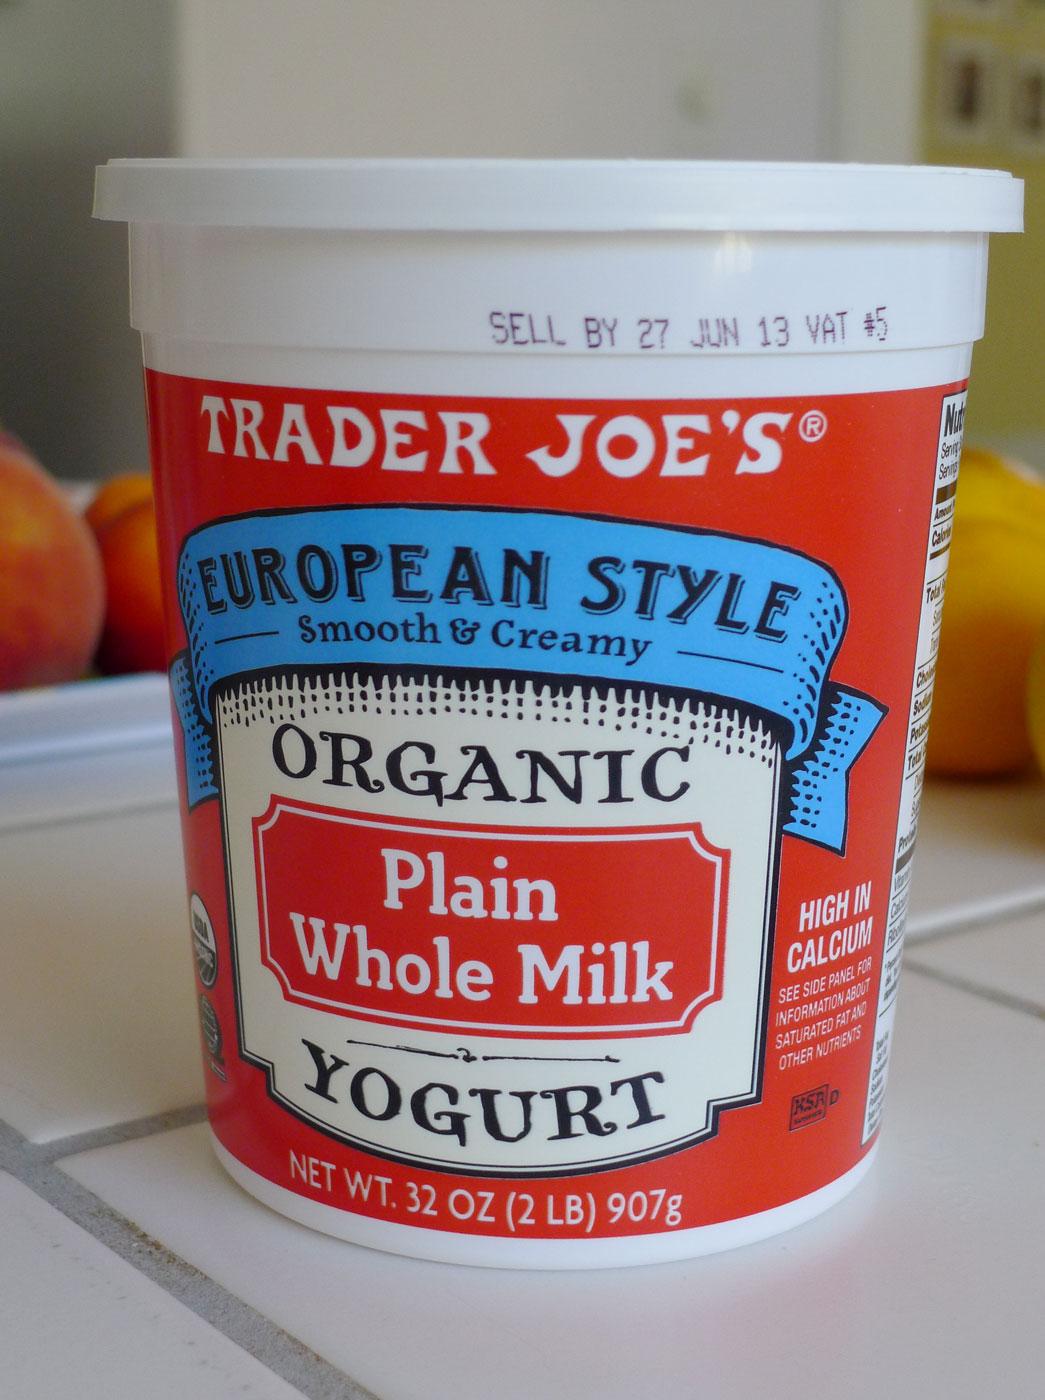 Trader Joe's Organic Plain Whole Milk Yogurt